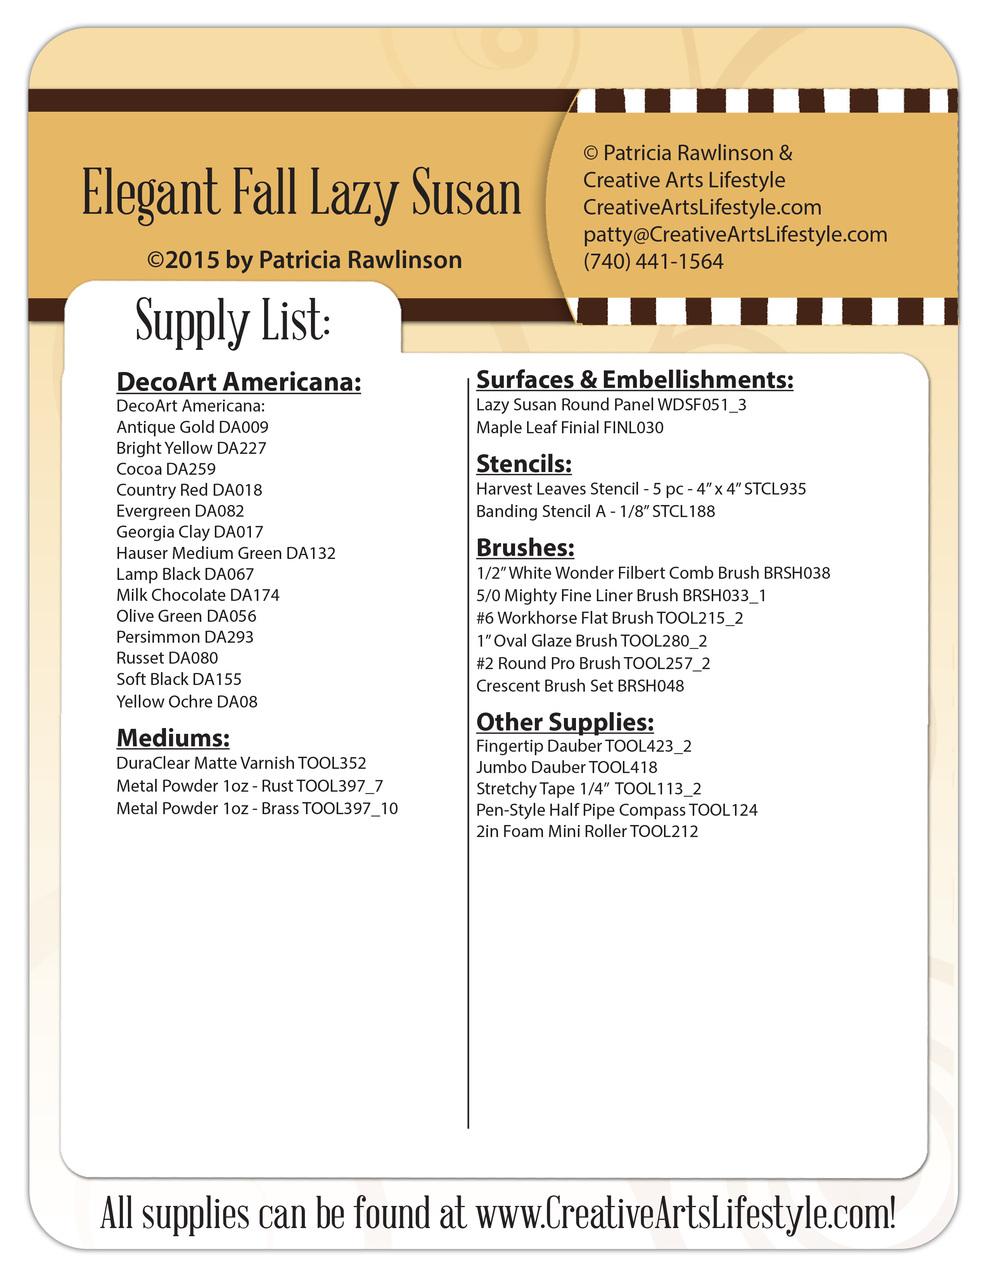 Elegant Fall Lazy Susan DVD and Pattern Packet - Patricia Rawlinson